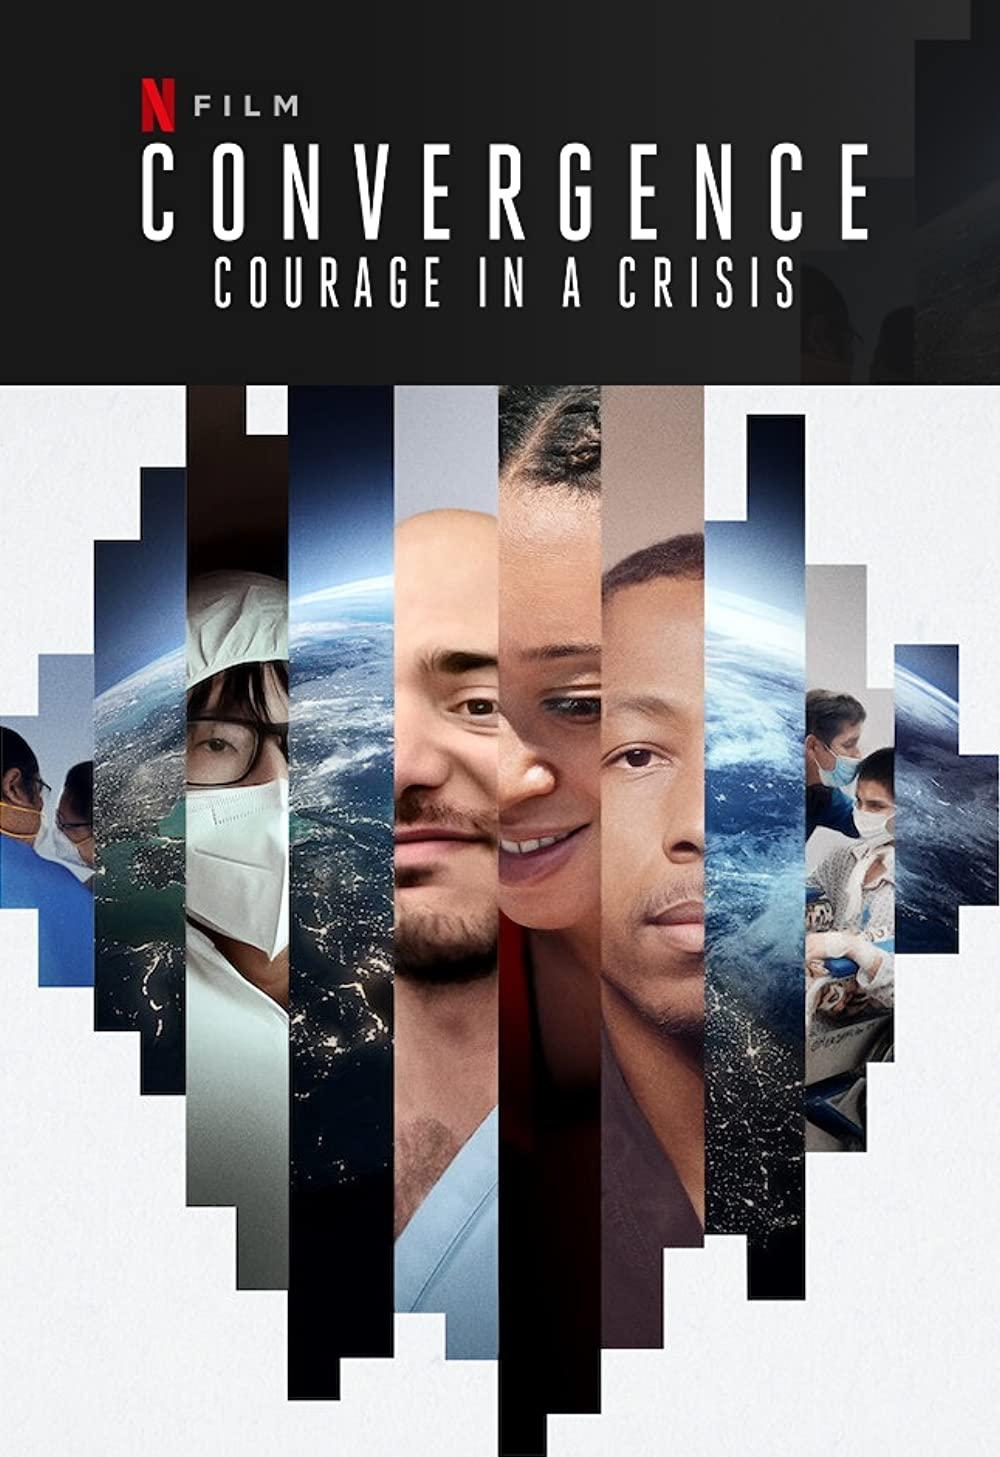 Convergence: Courage in a Crisis (2021)Convergence: ร่วมกล้าฝ่าวิกฤติ ดูหนังฟรีออนไลน์